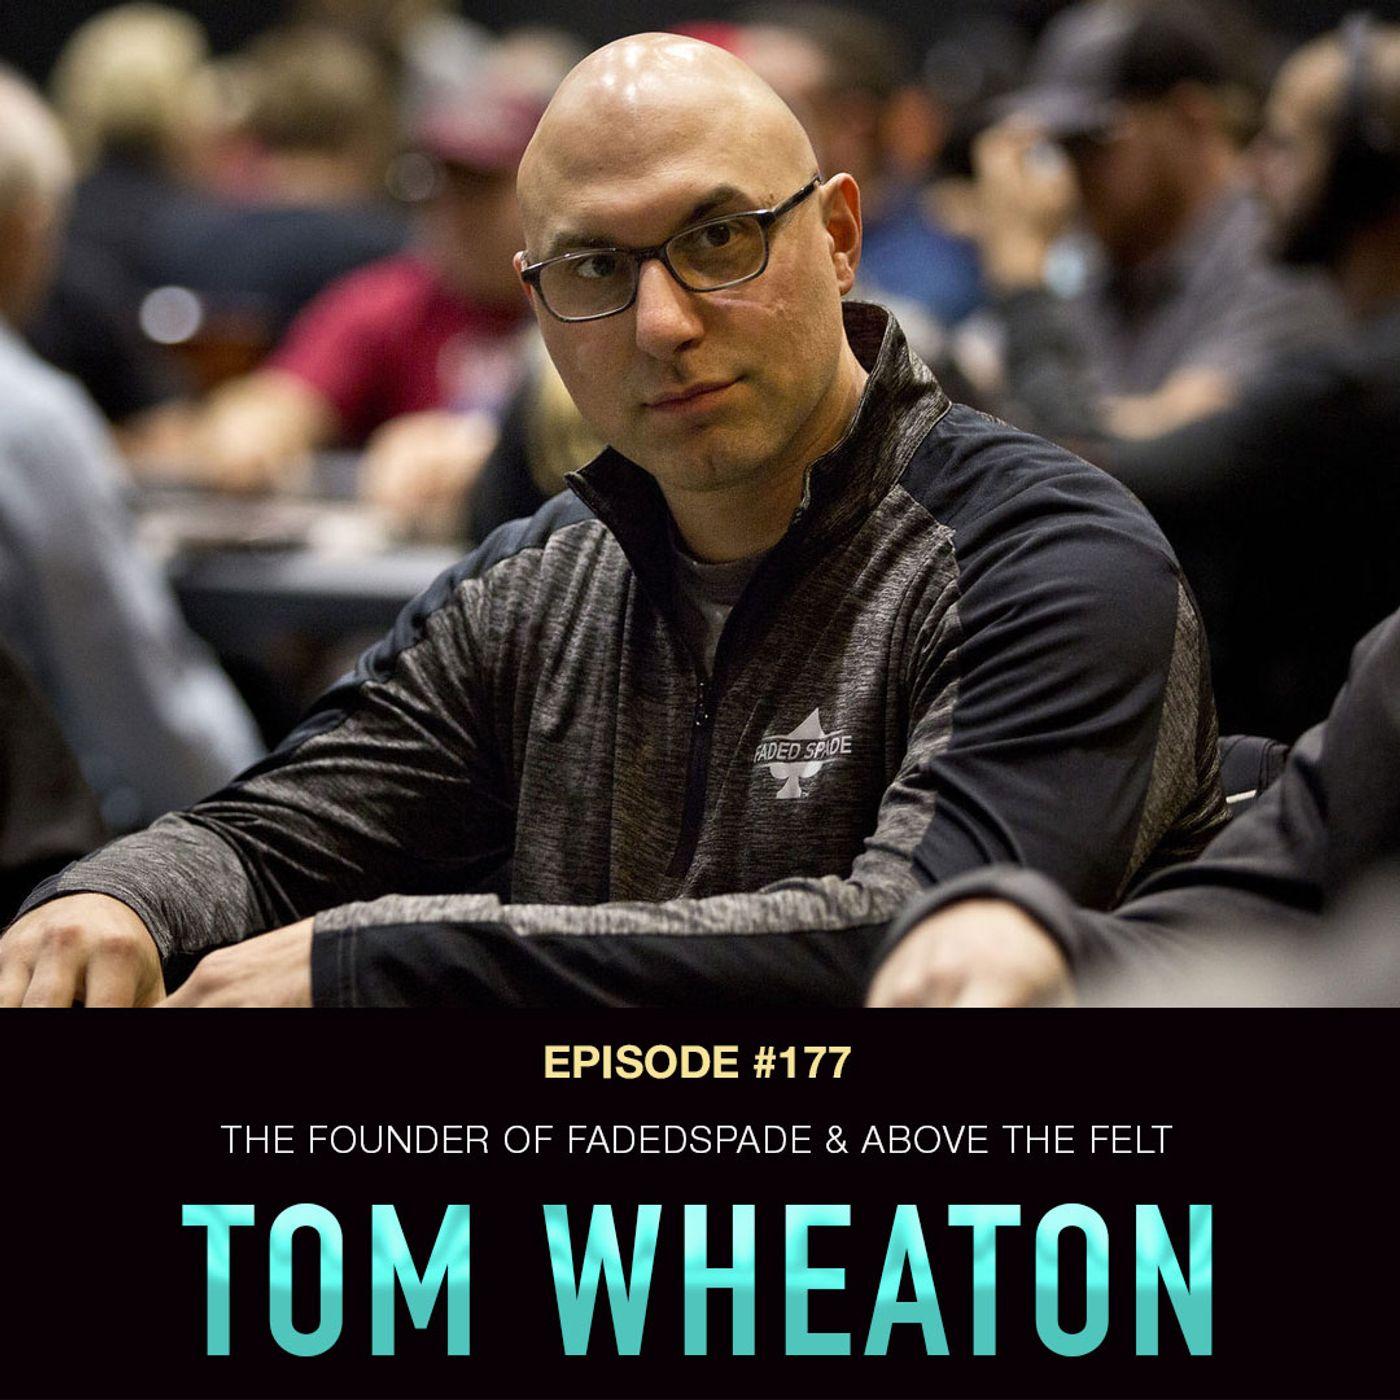 #177 Tom Wheaton: Round 2 w/ The Founder of FadedSpade & Above the Felt